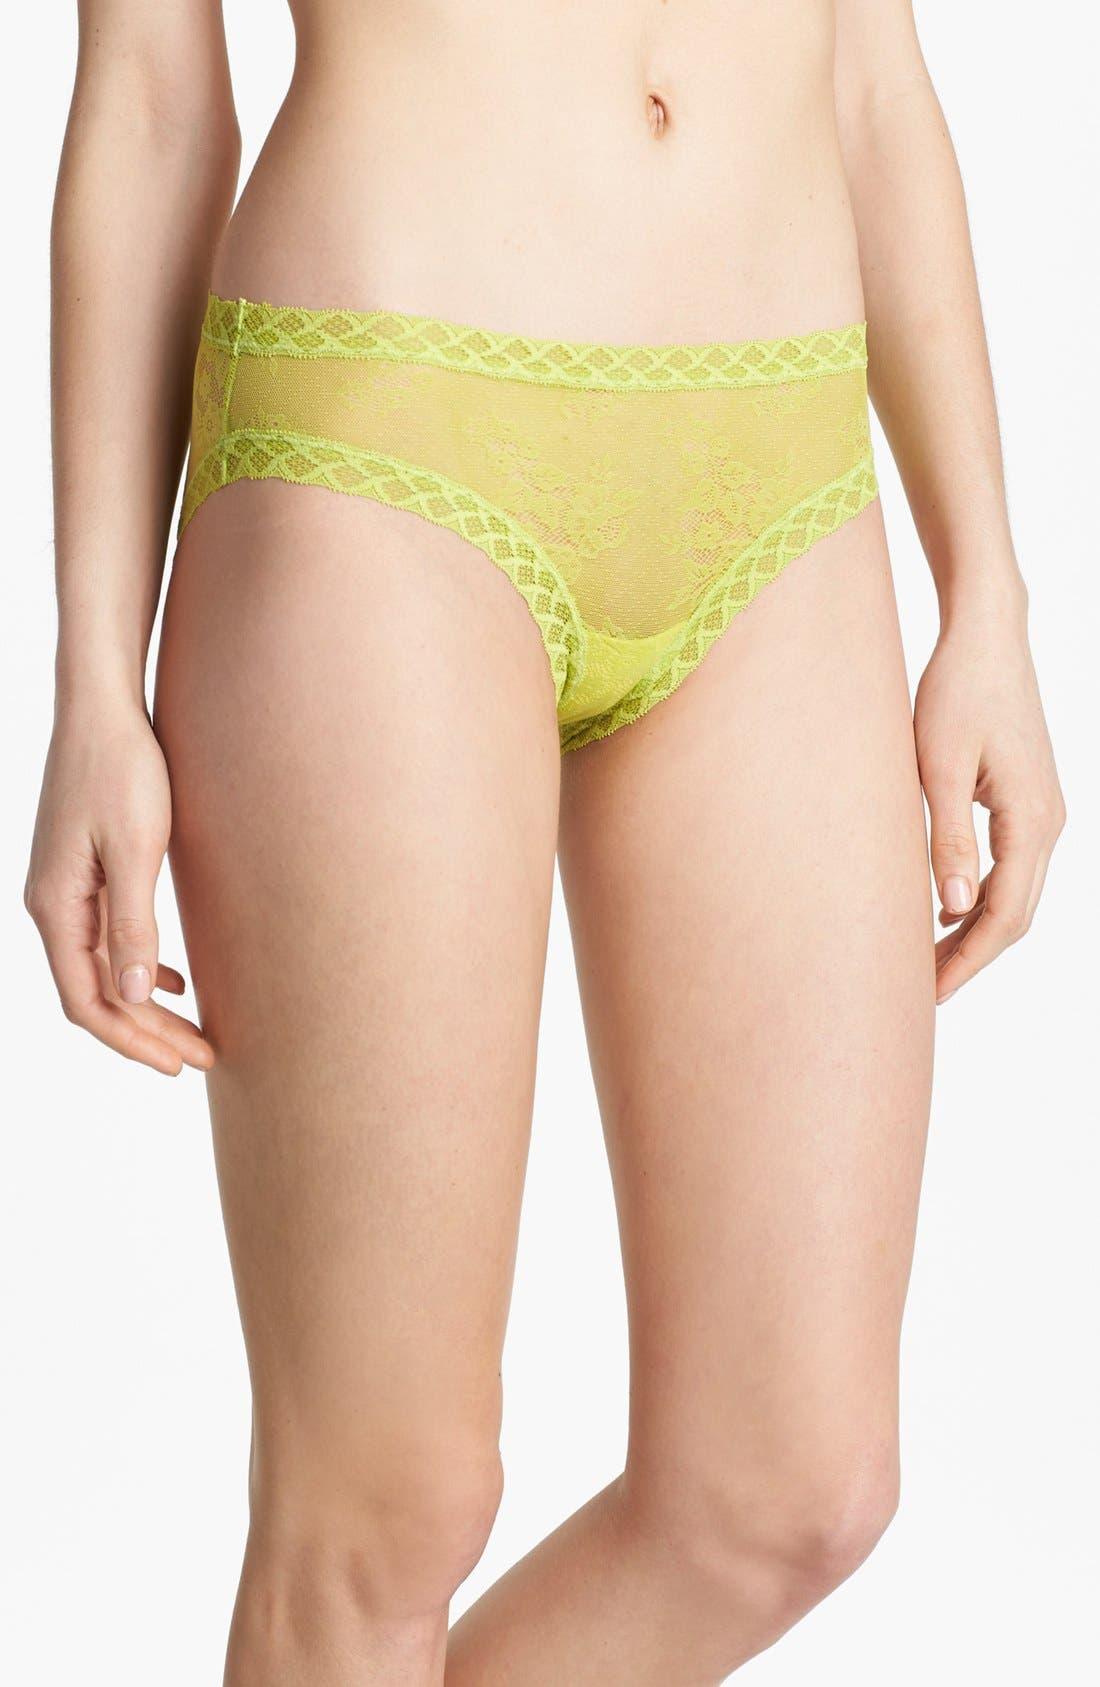 Alternate Image 1 Selected - Natori 'Bliss' Lace Bikini